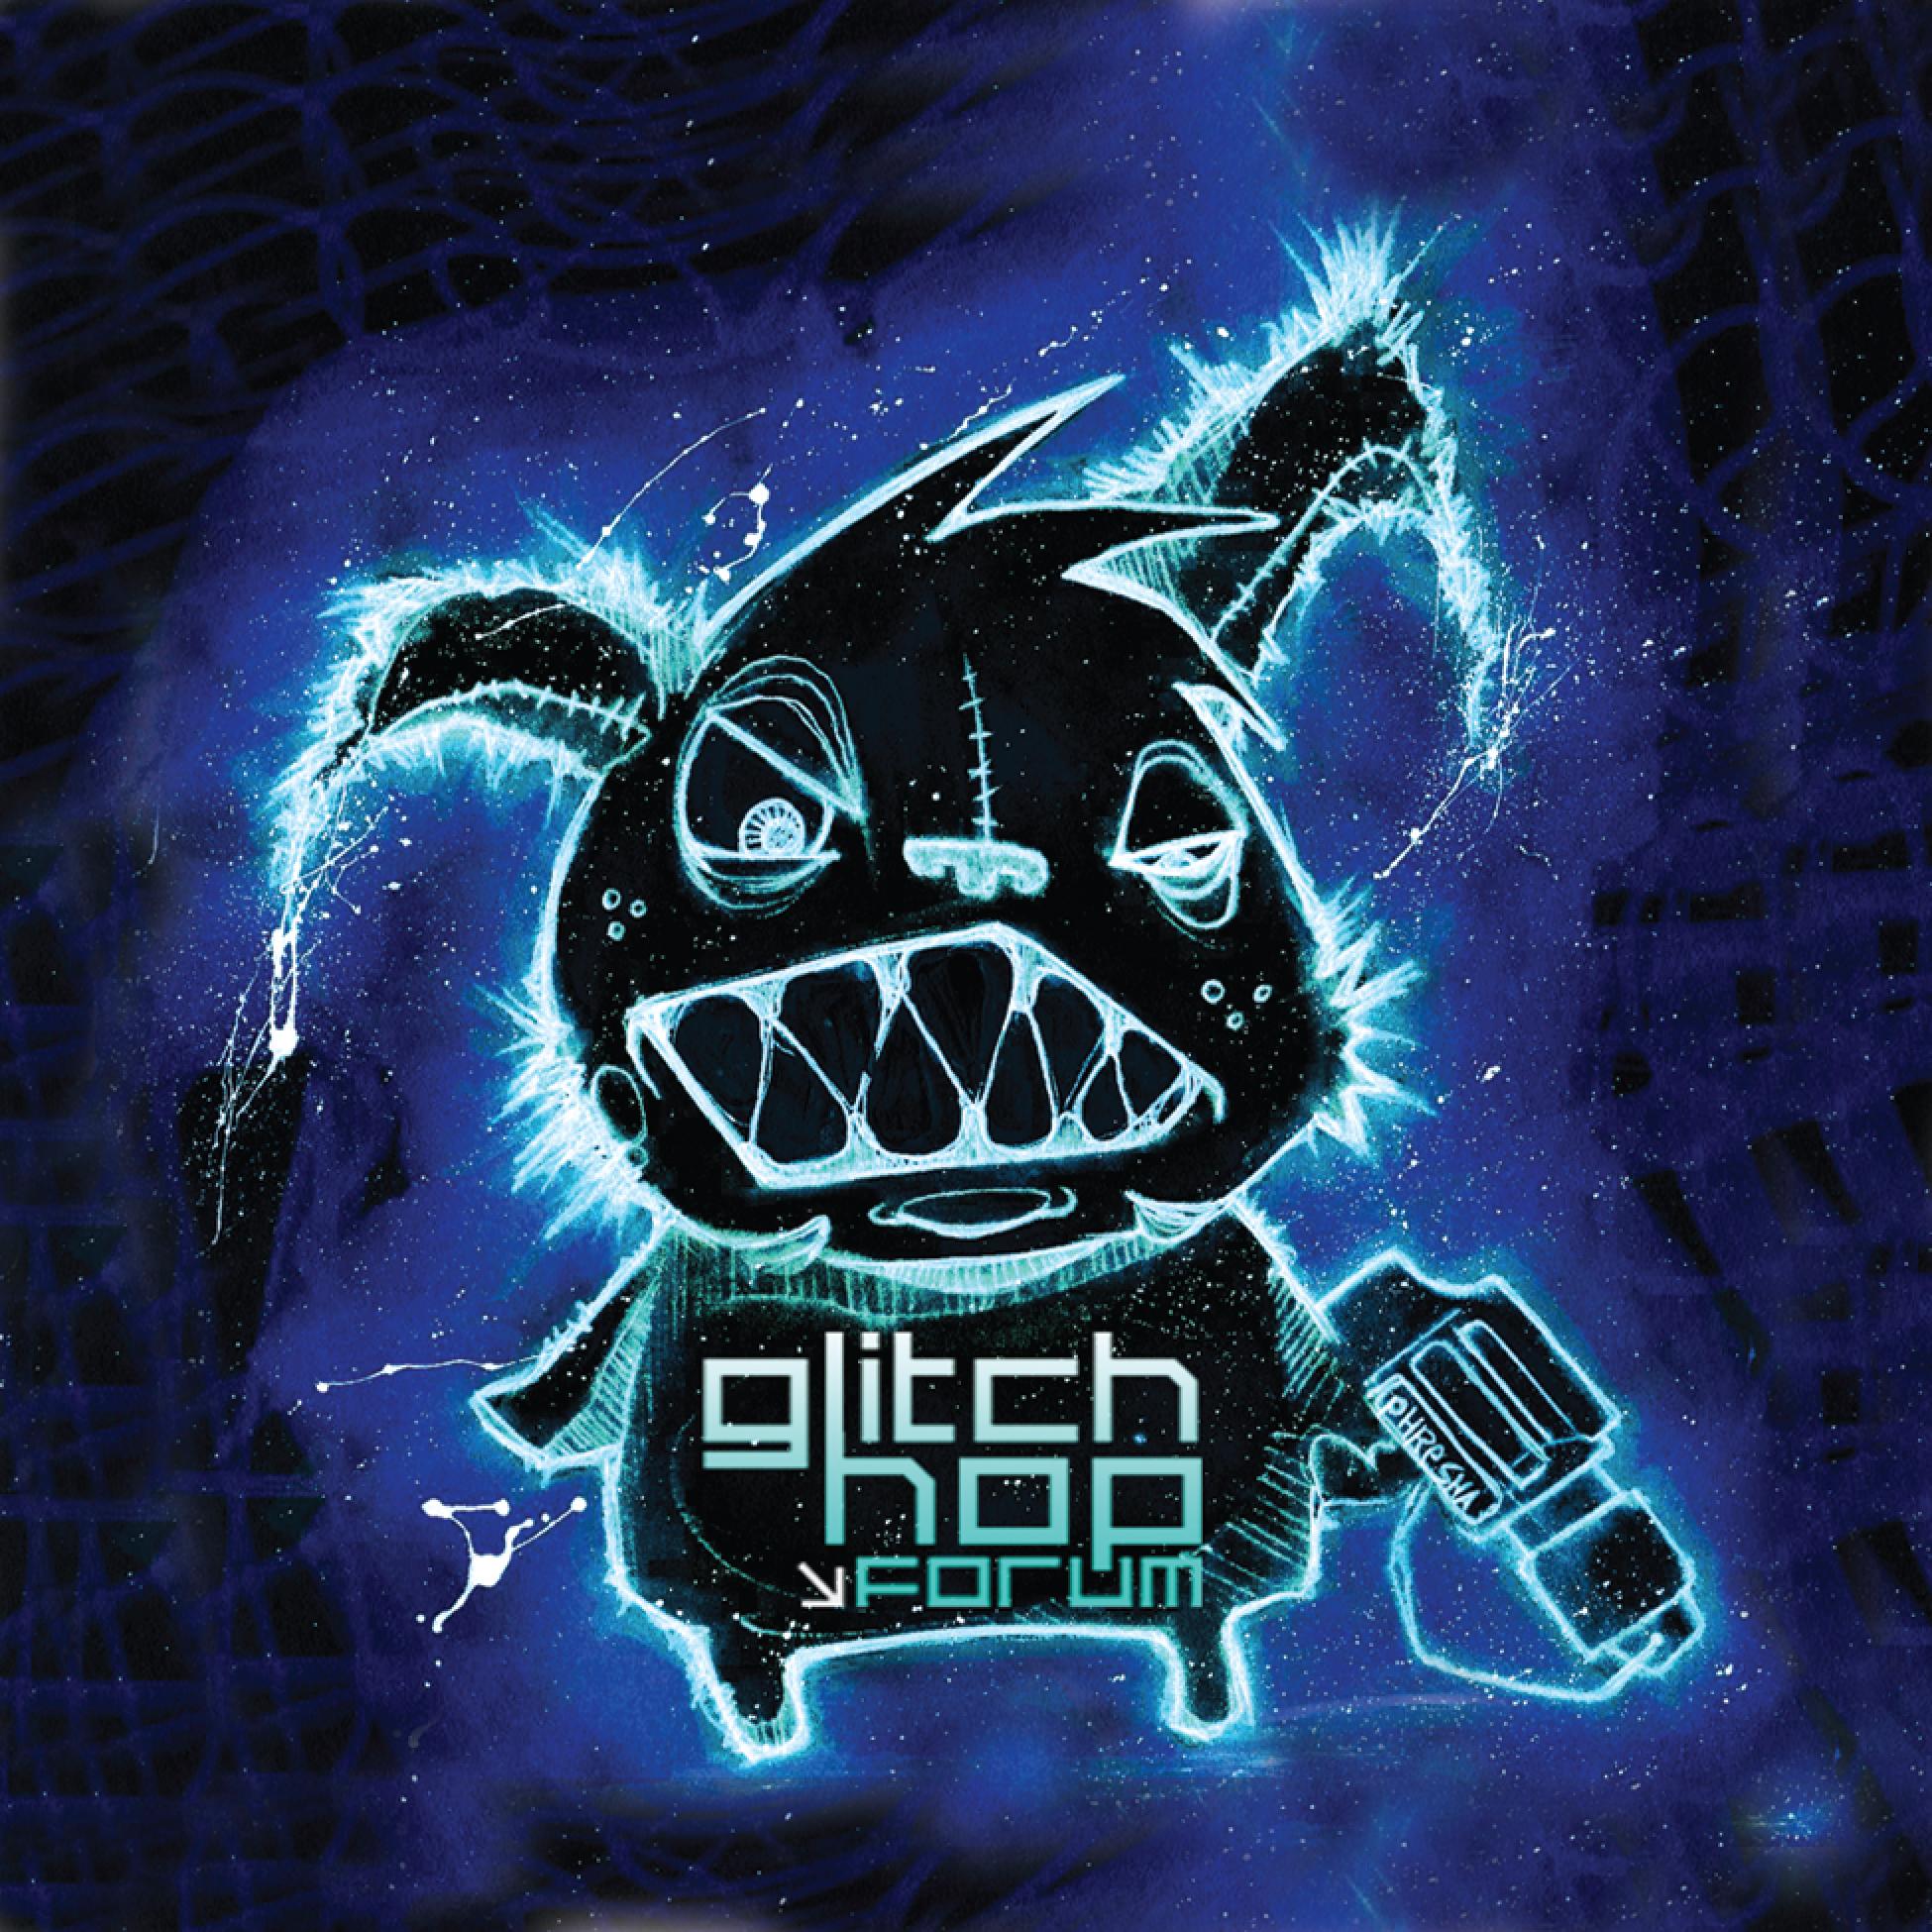 glitchhopforumbunny